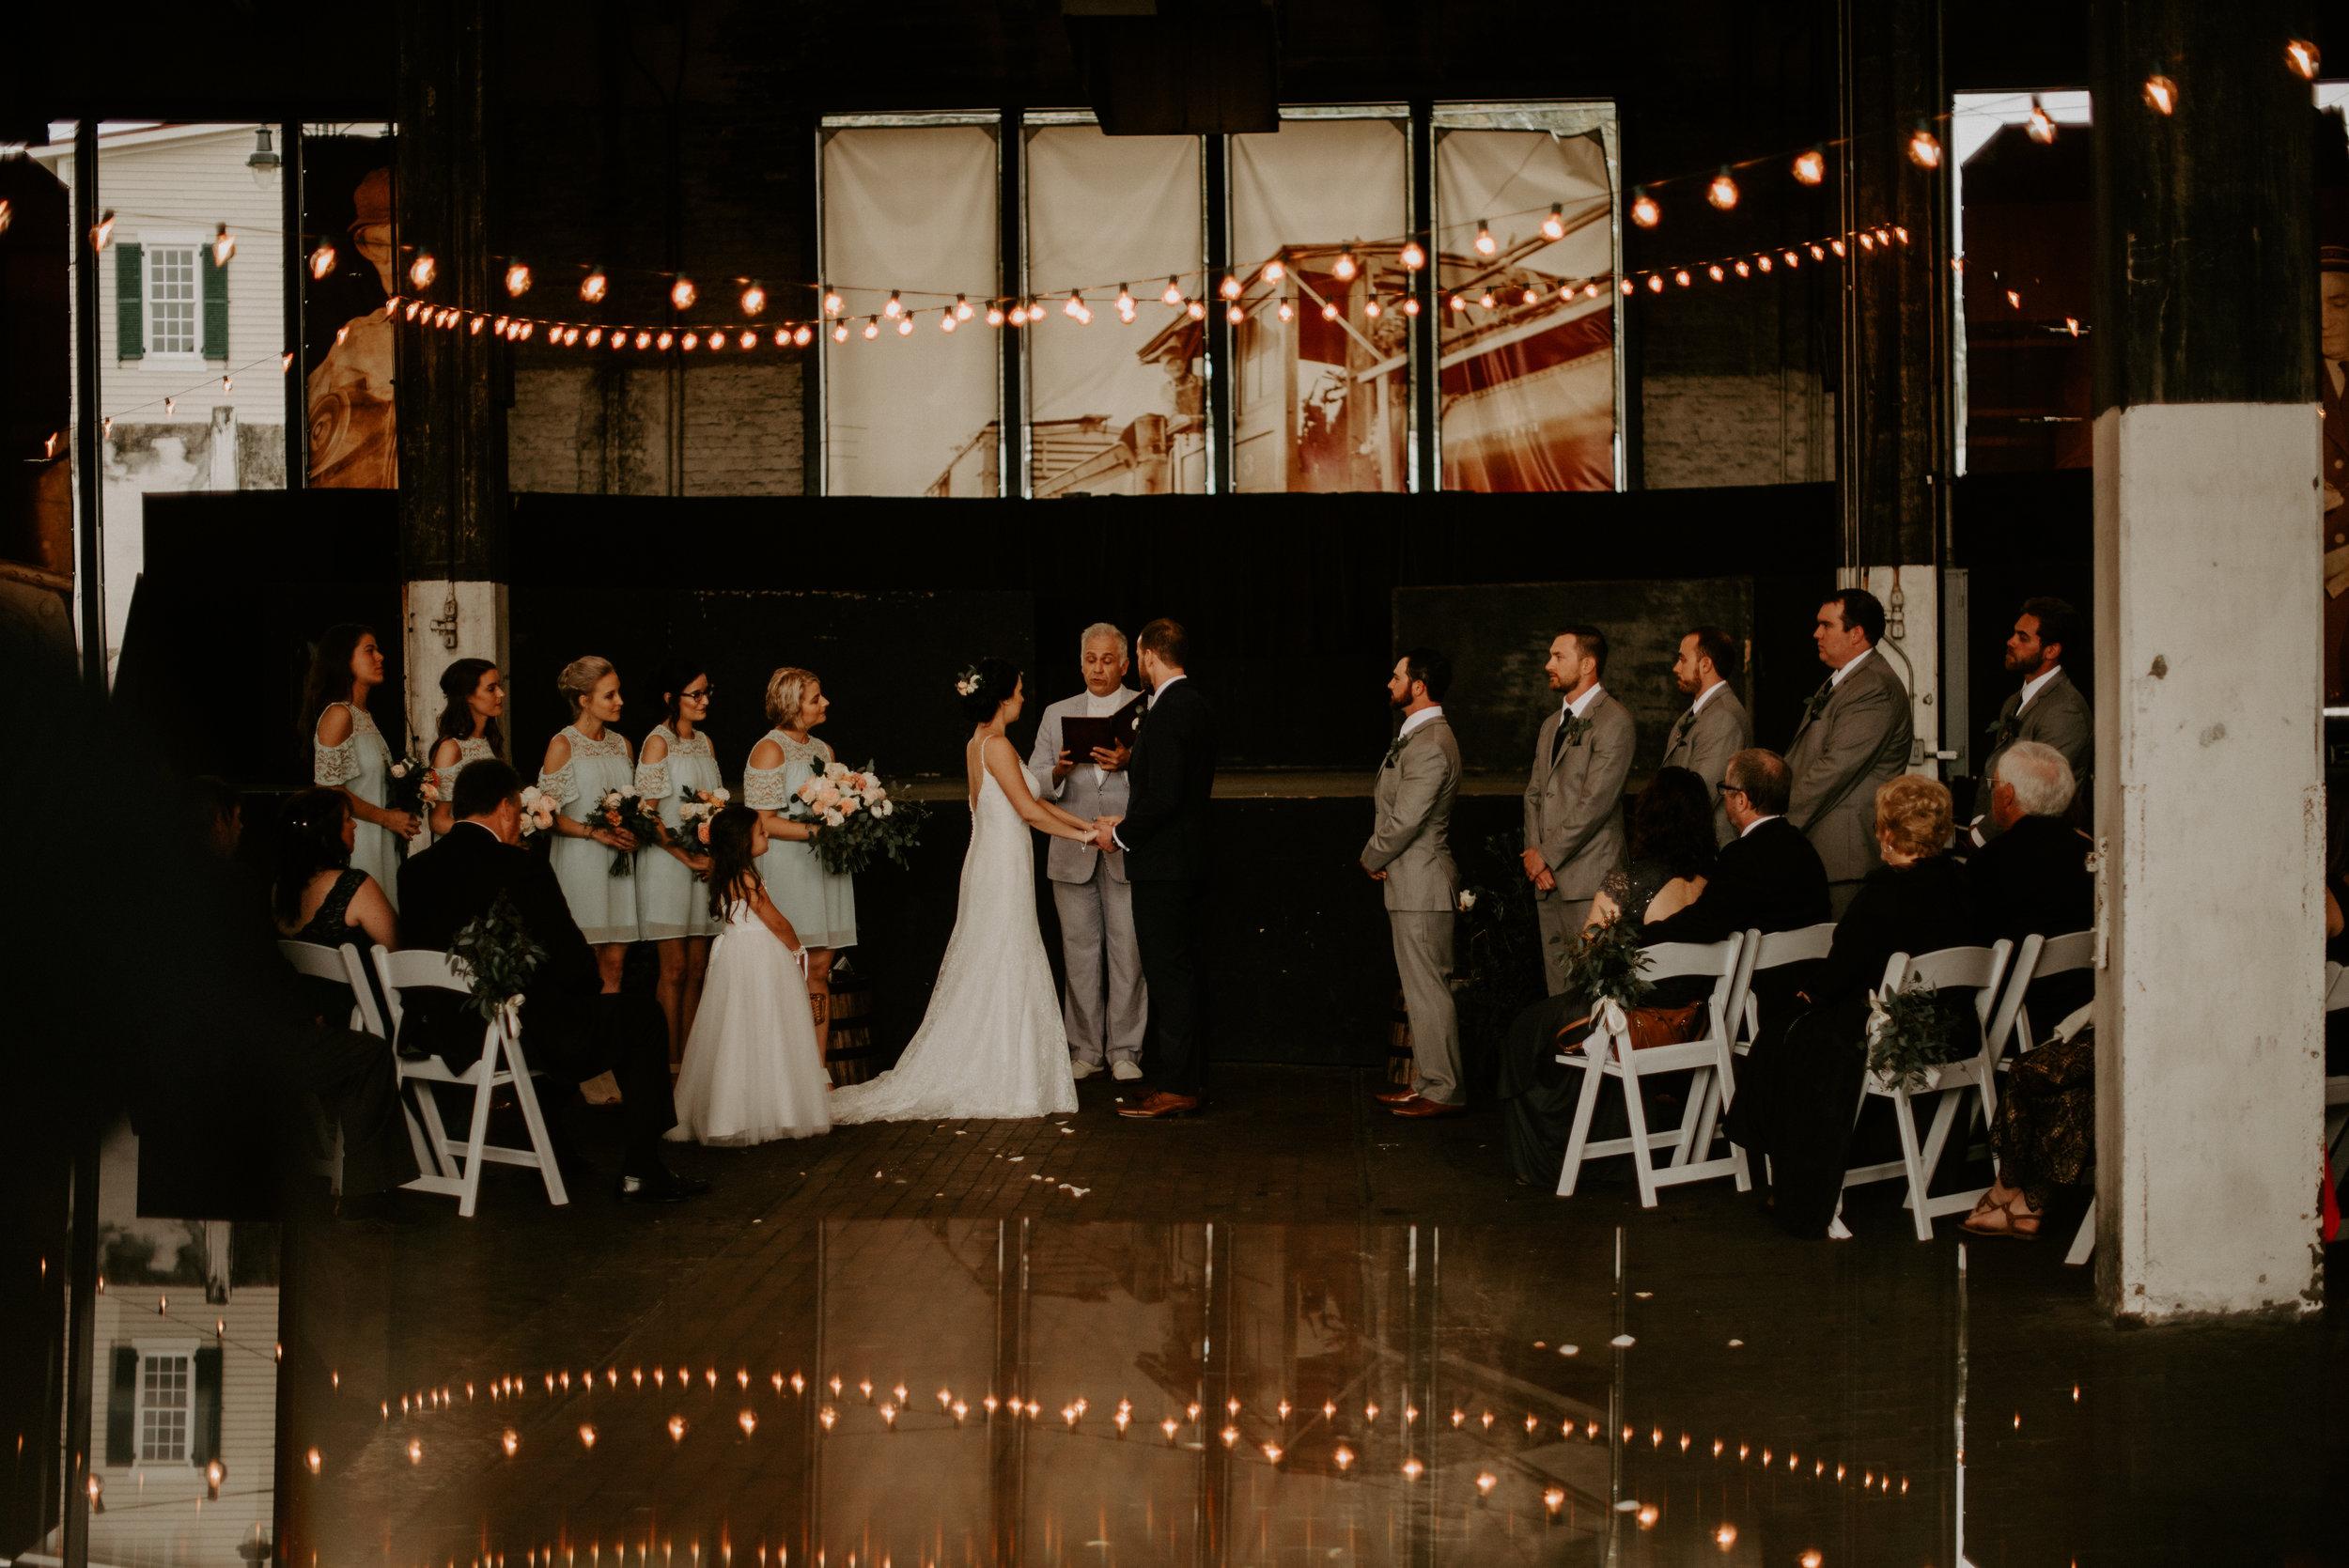 savannah-bridal-shop-andrea-and-mike-evergold-photography-georgia-state-railroad-museum-wedding-savannah-wedding-florist-savannah-wedding-planner-29.jpg